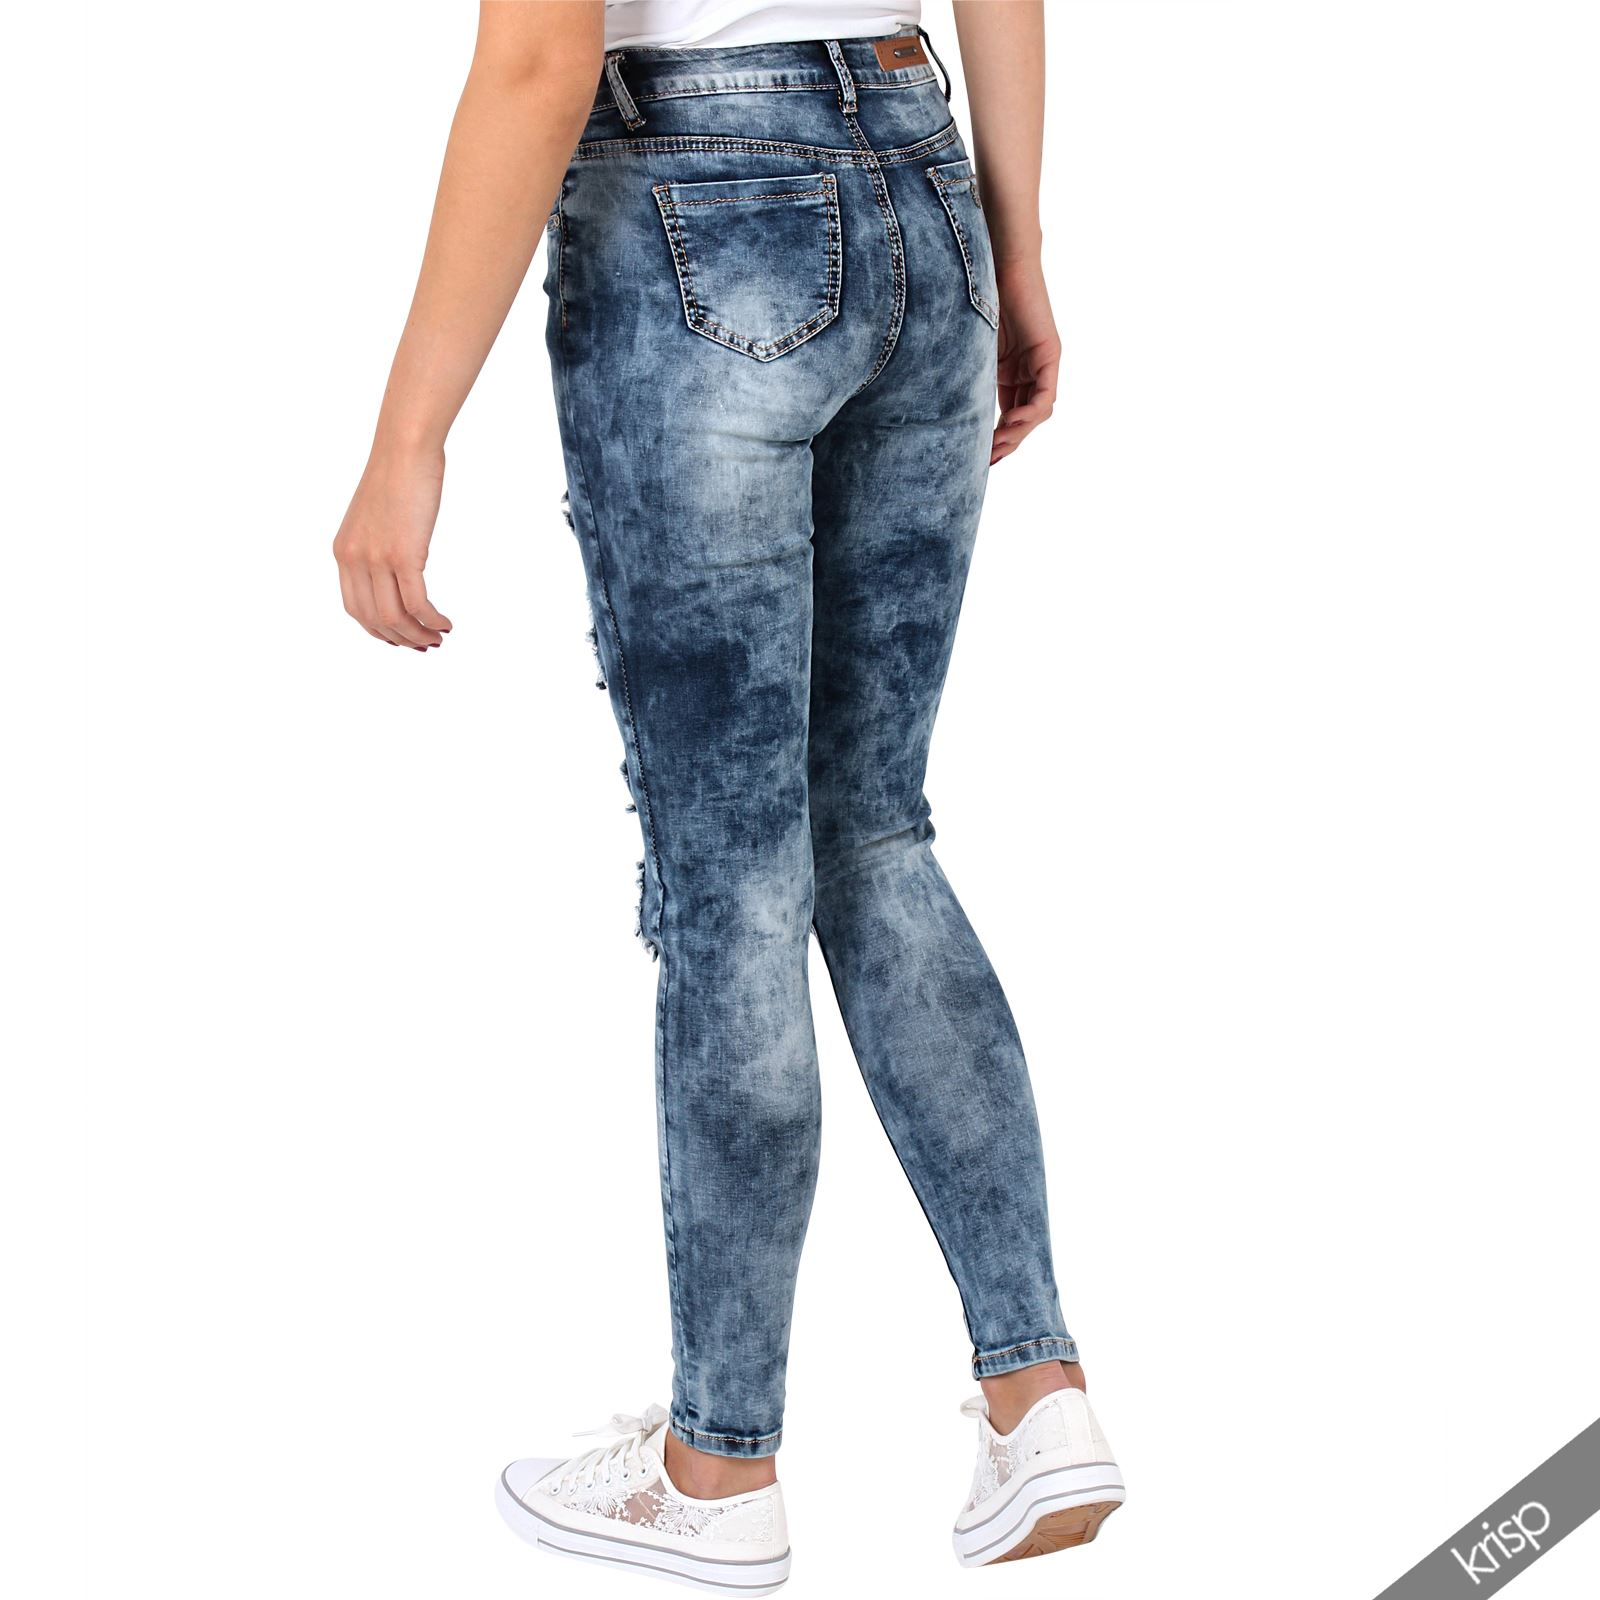 femmes pantalon jean slim trou d chir grunge taille haute d lav tie dye retro ebay. Black Bedroom Furniture Sets. Home Design Ideas